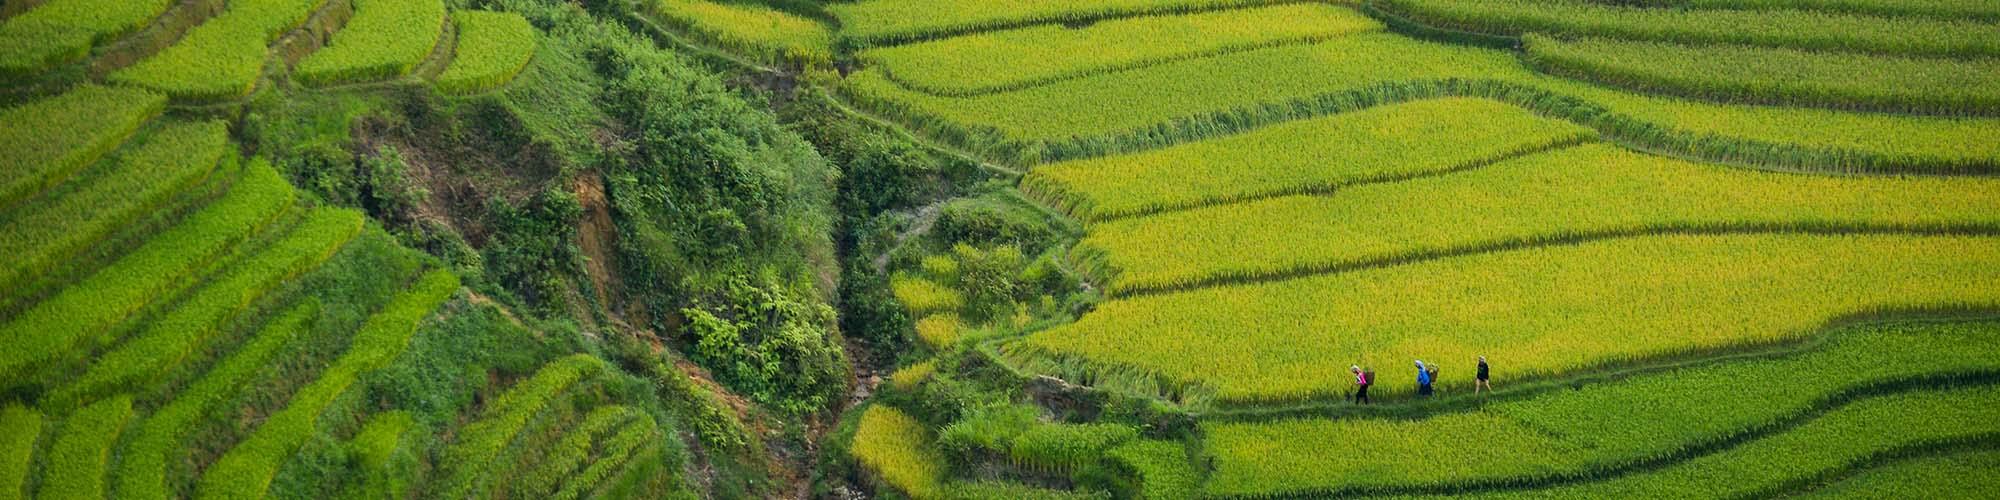 Doan Tuan, Reisfelder, Vietnam